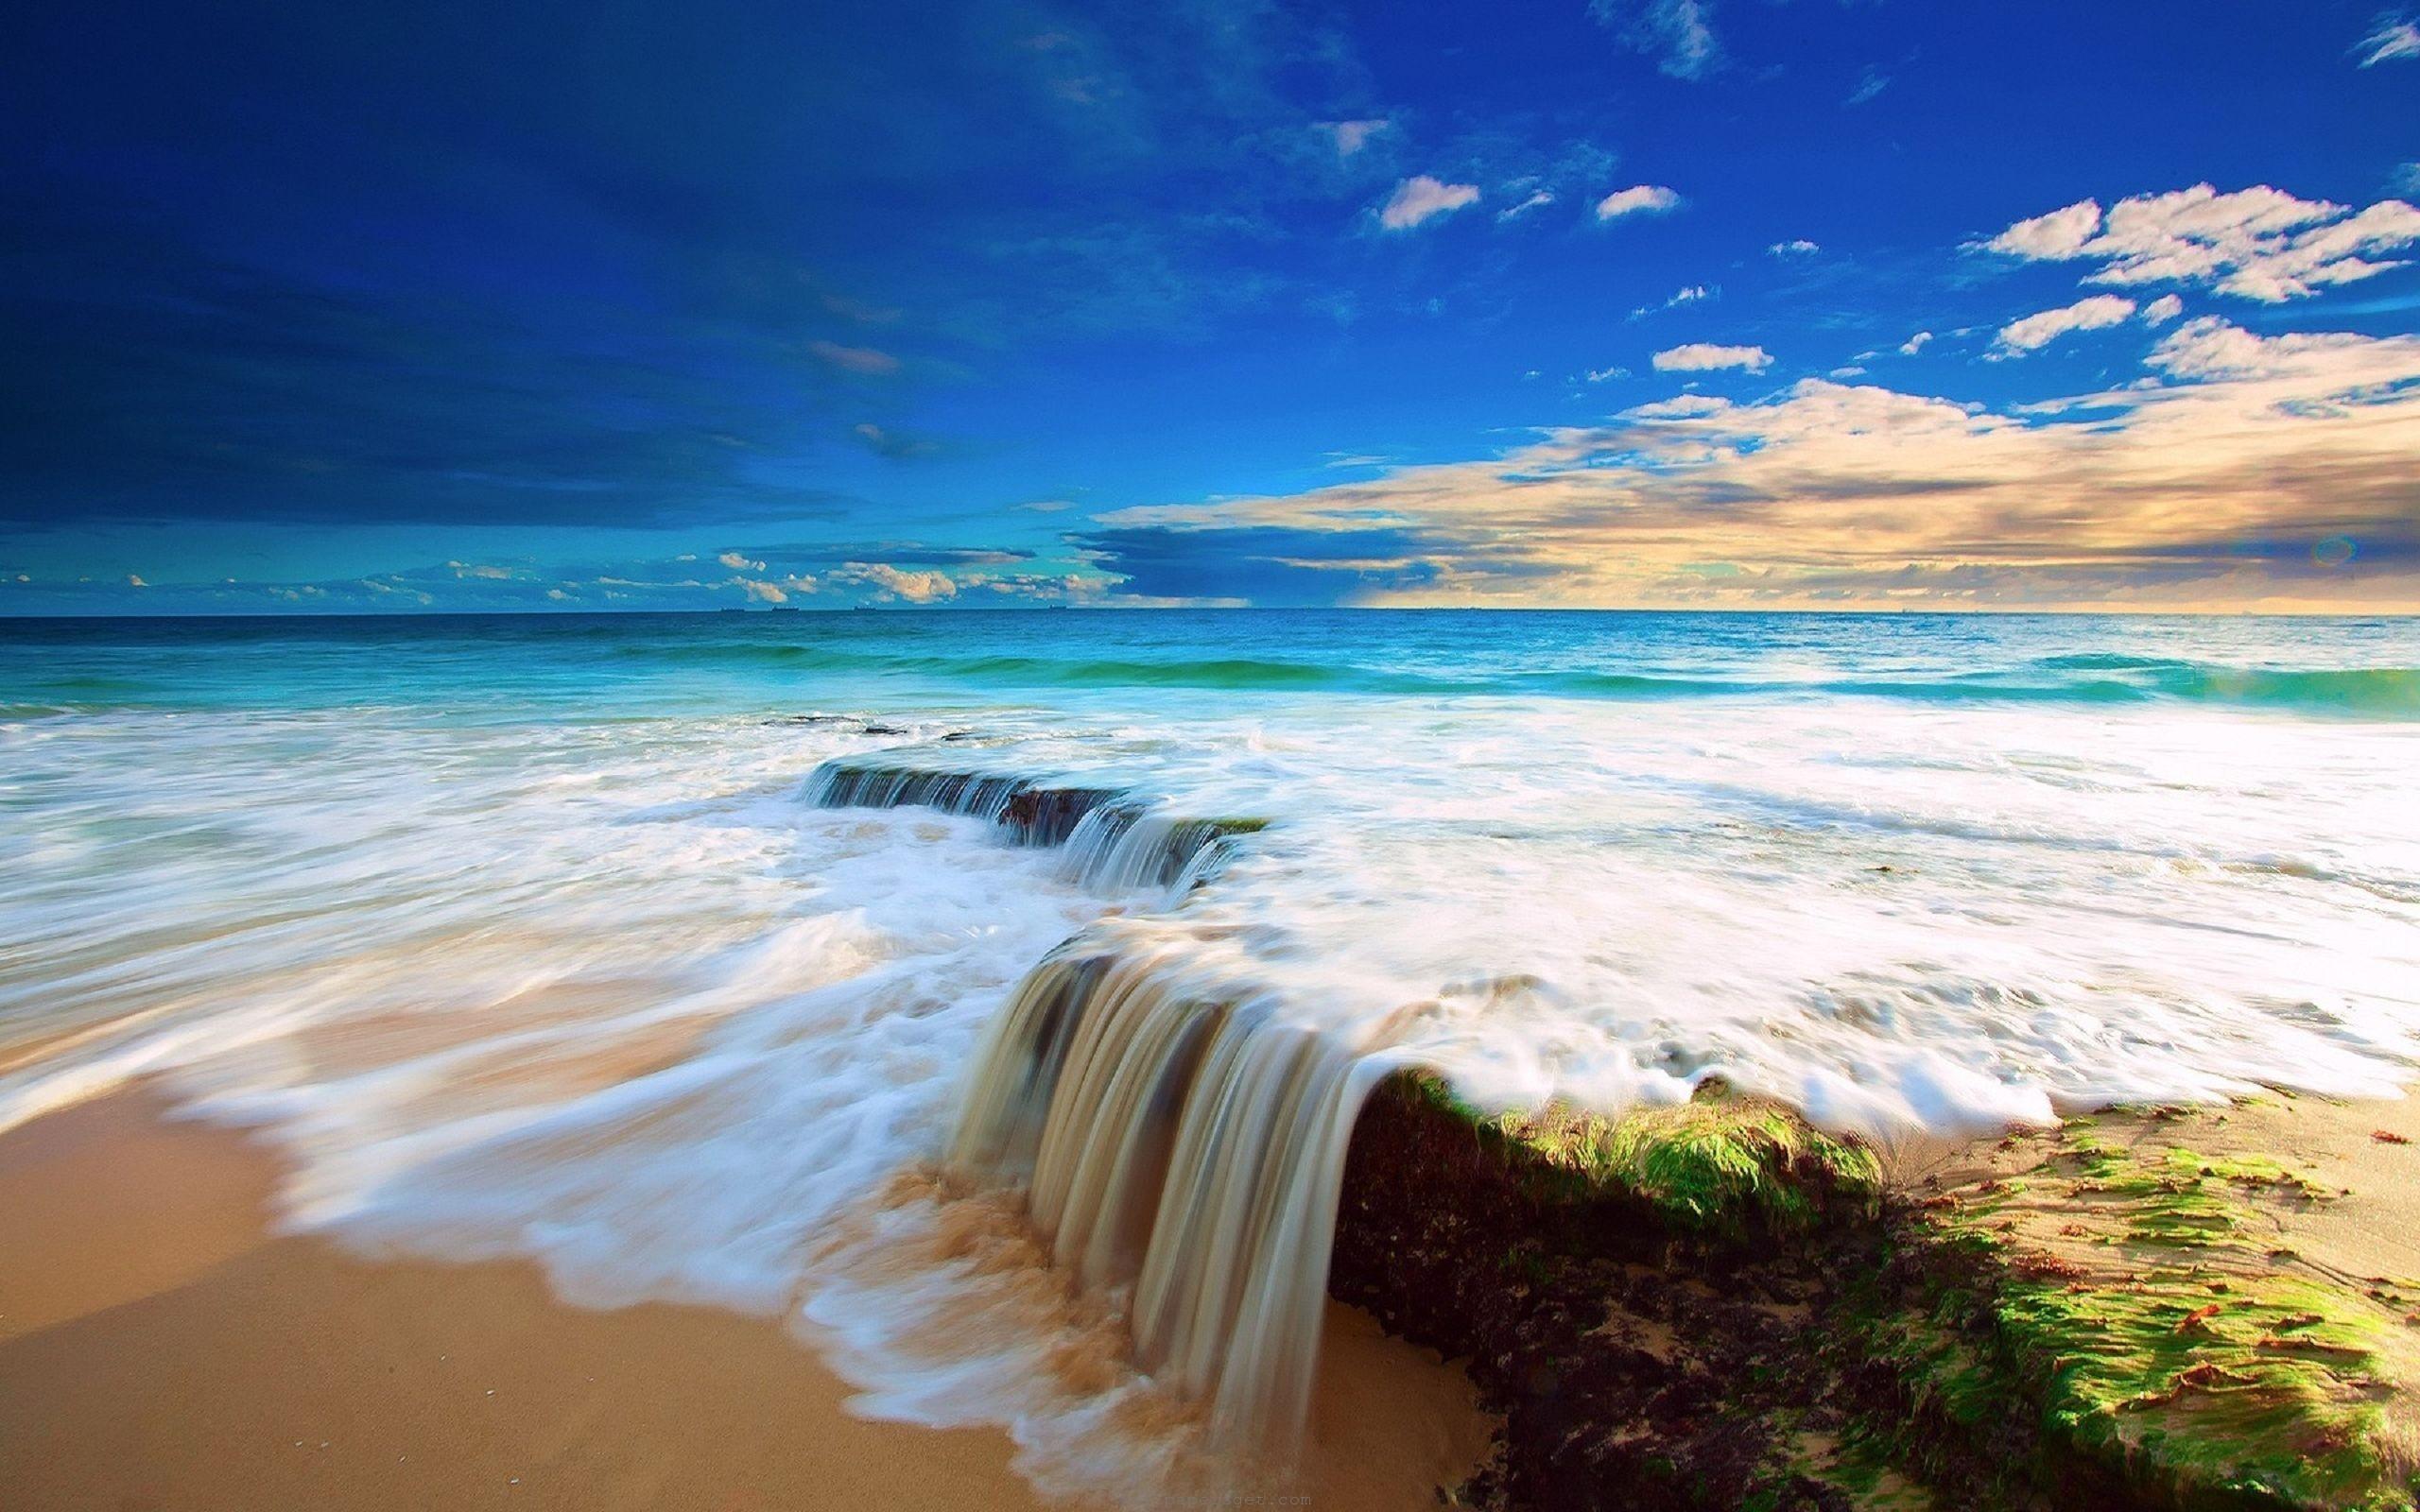 Sea And Beach Wallpapers Landscape Wallpapers, Nature Landscape Wallpaper  For Desktop, Pc, Laptop. Nature Landscape Wallpapers Hd Wallpapers, …